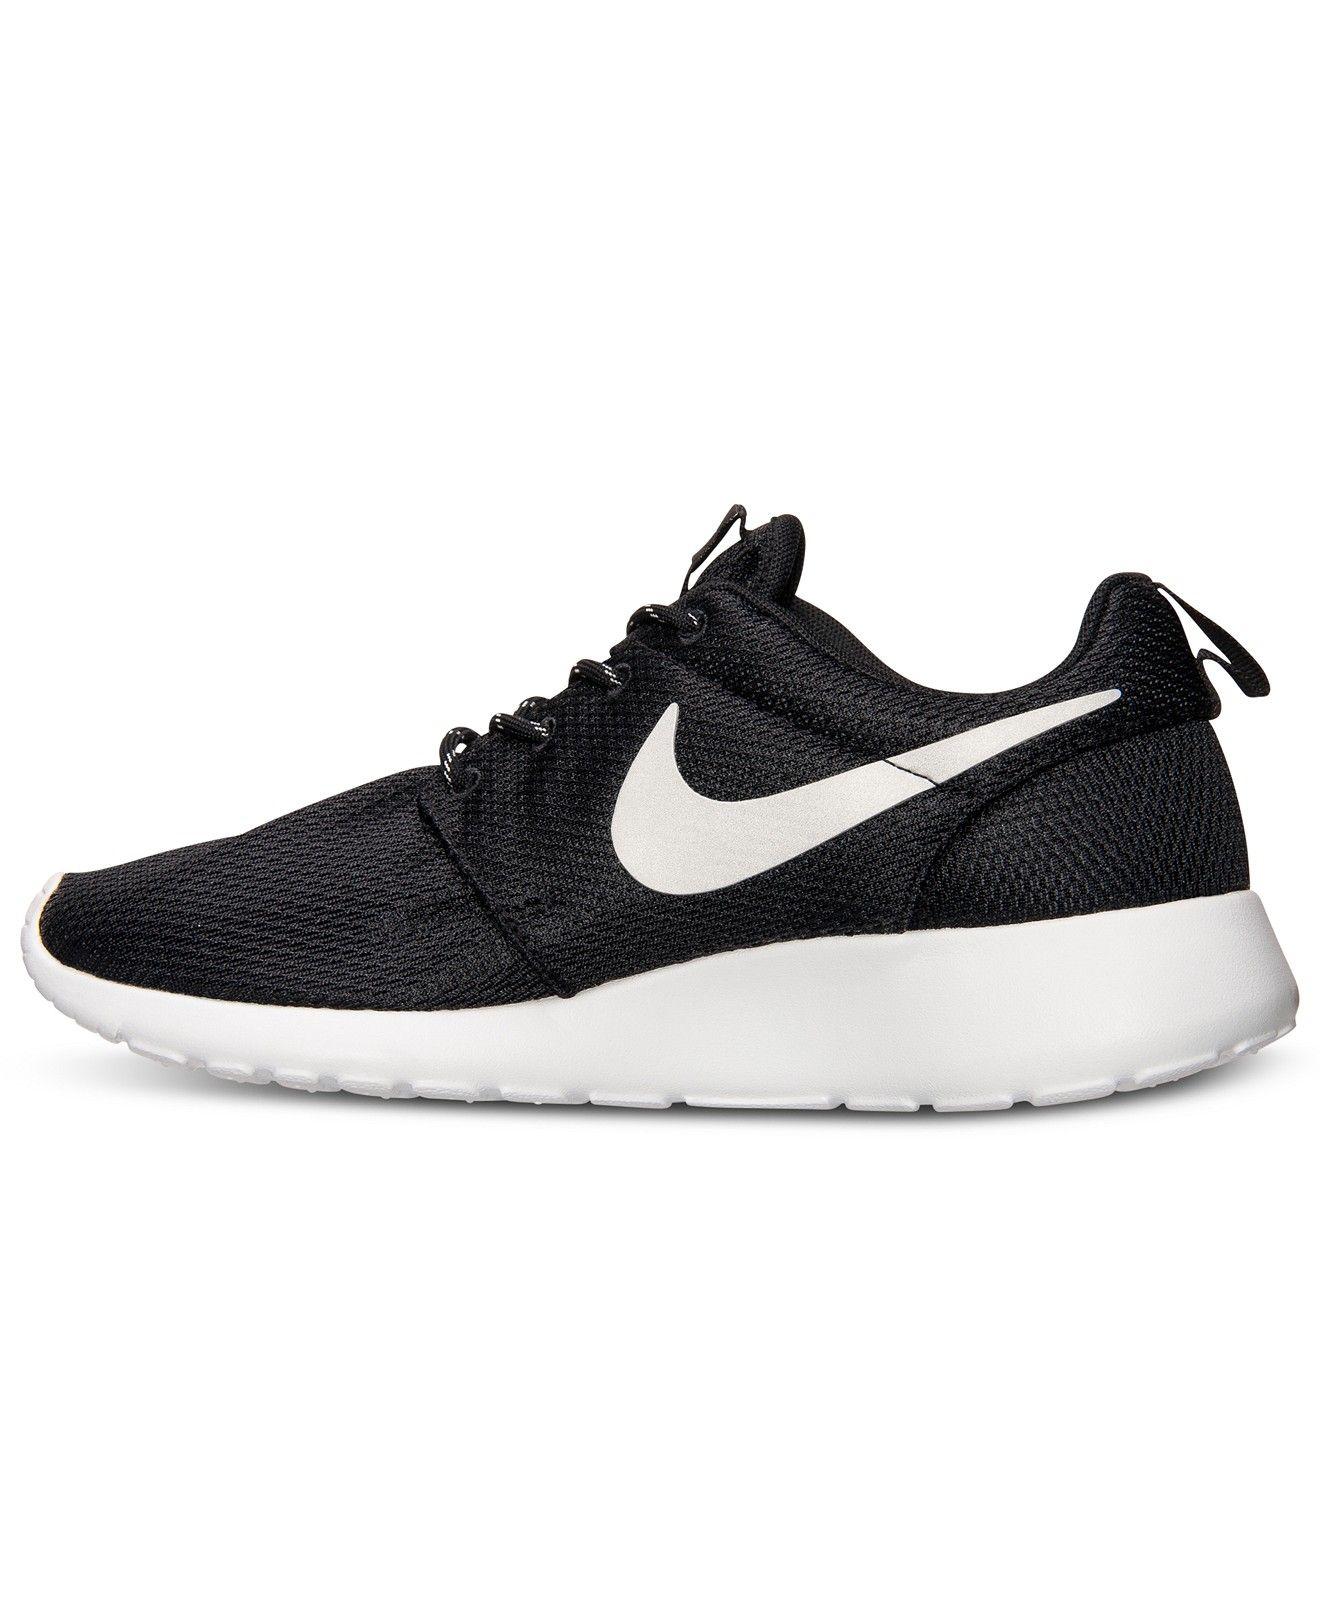 Nike Women's Roshe Run Casual Sneakers